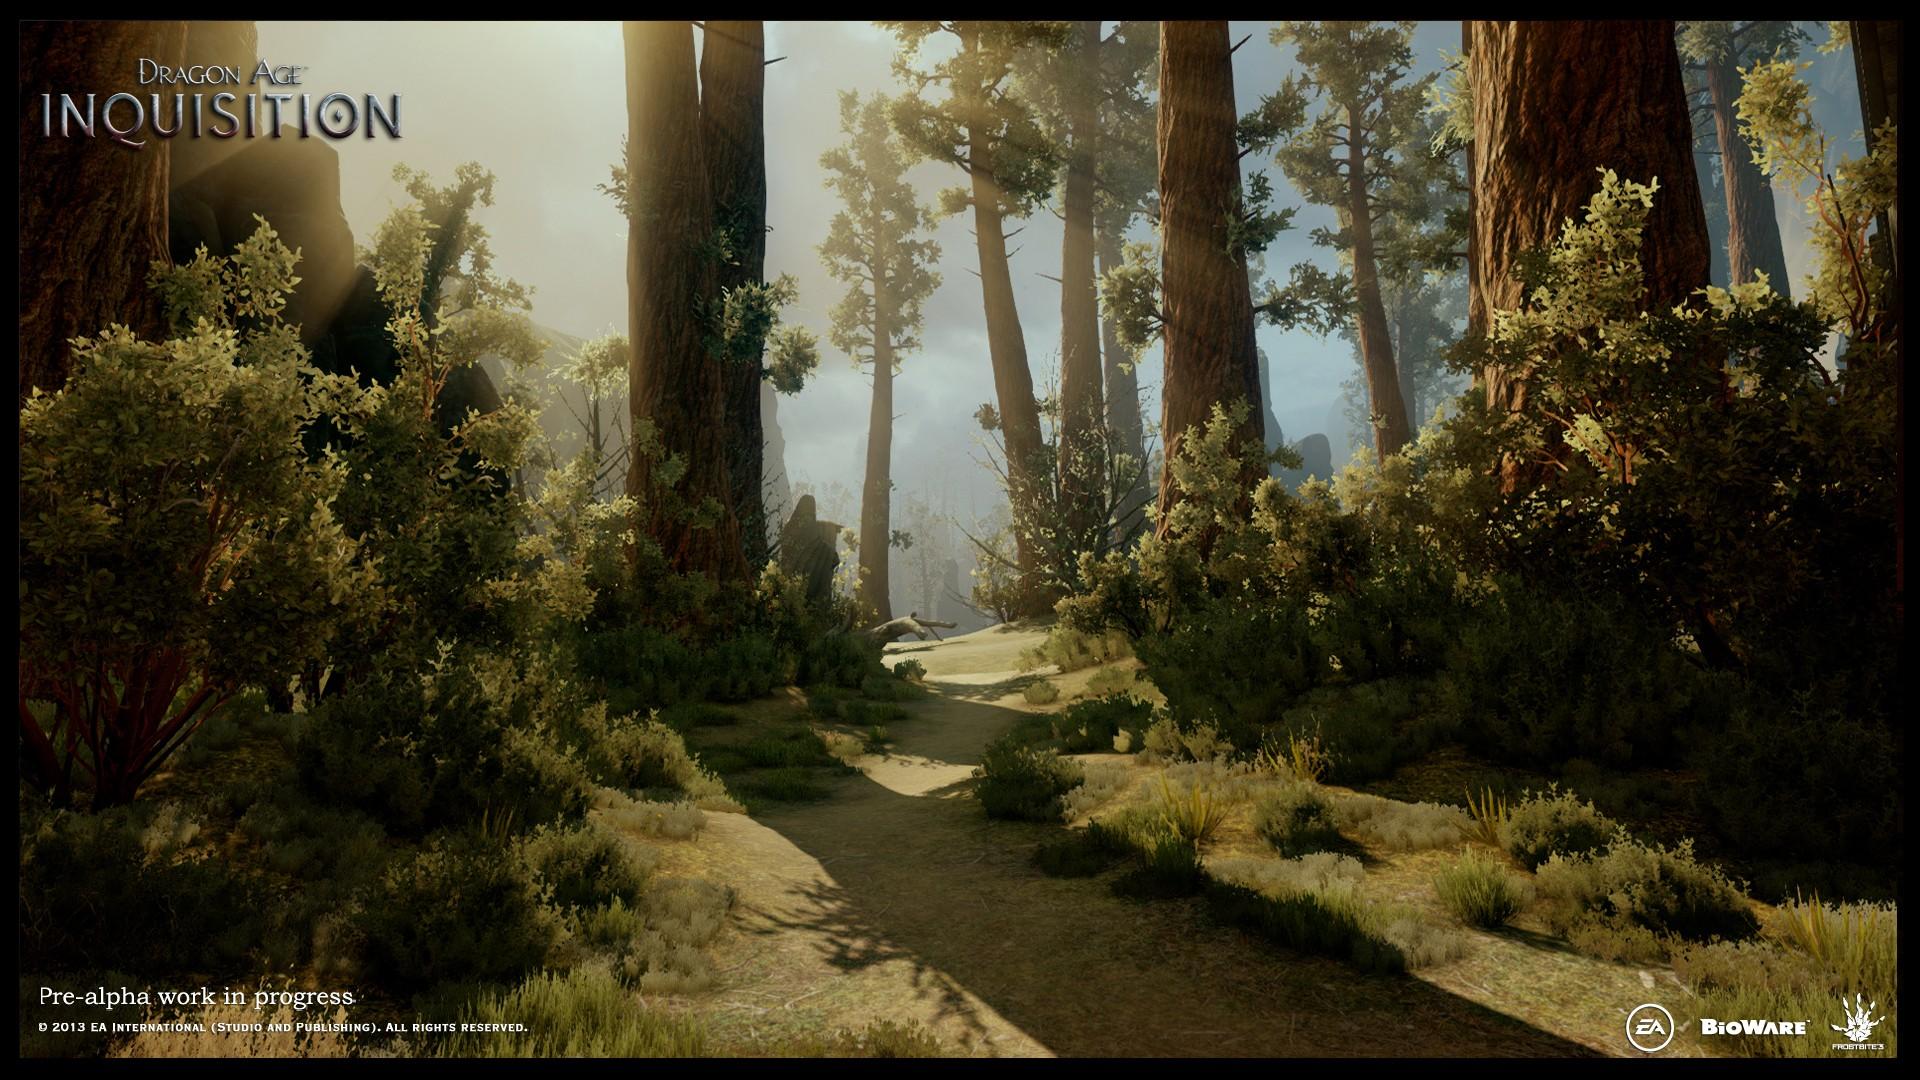 Dragon Age: Inquisition s různorodými lokalitami 91068